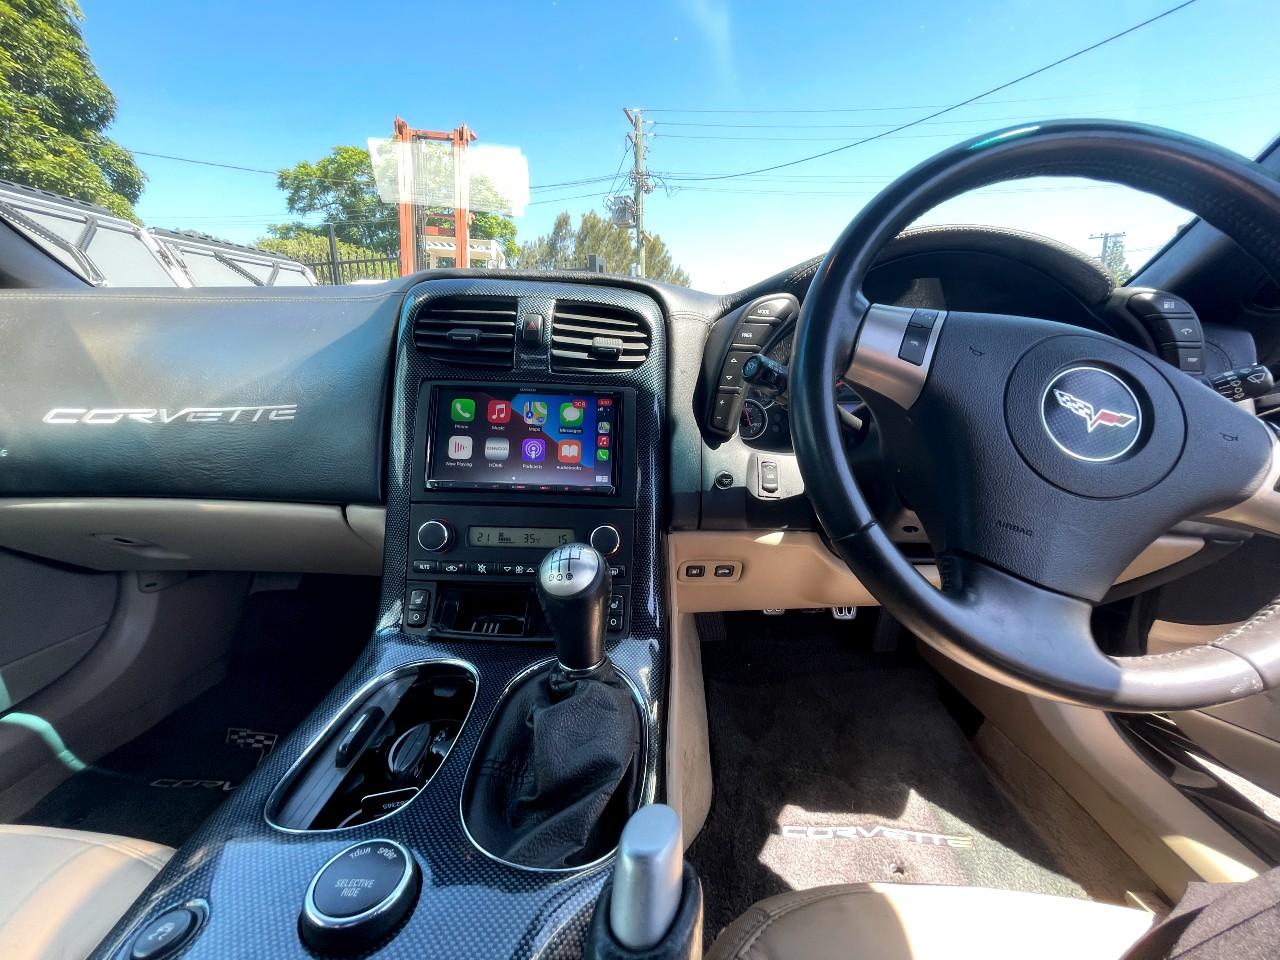 Corvette Apple CarPlay and Android Auto Upgrade - https://www.newcastleprosound.com.au/wp-content/uploads/2021/02/corvette.jpg